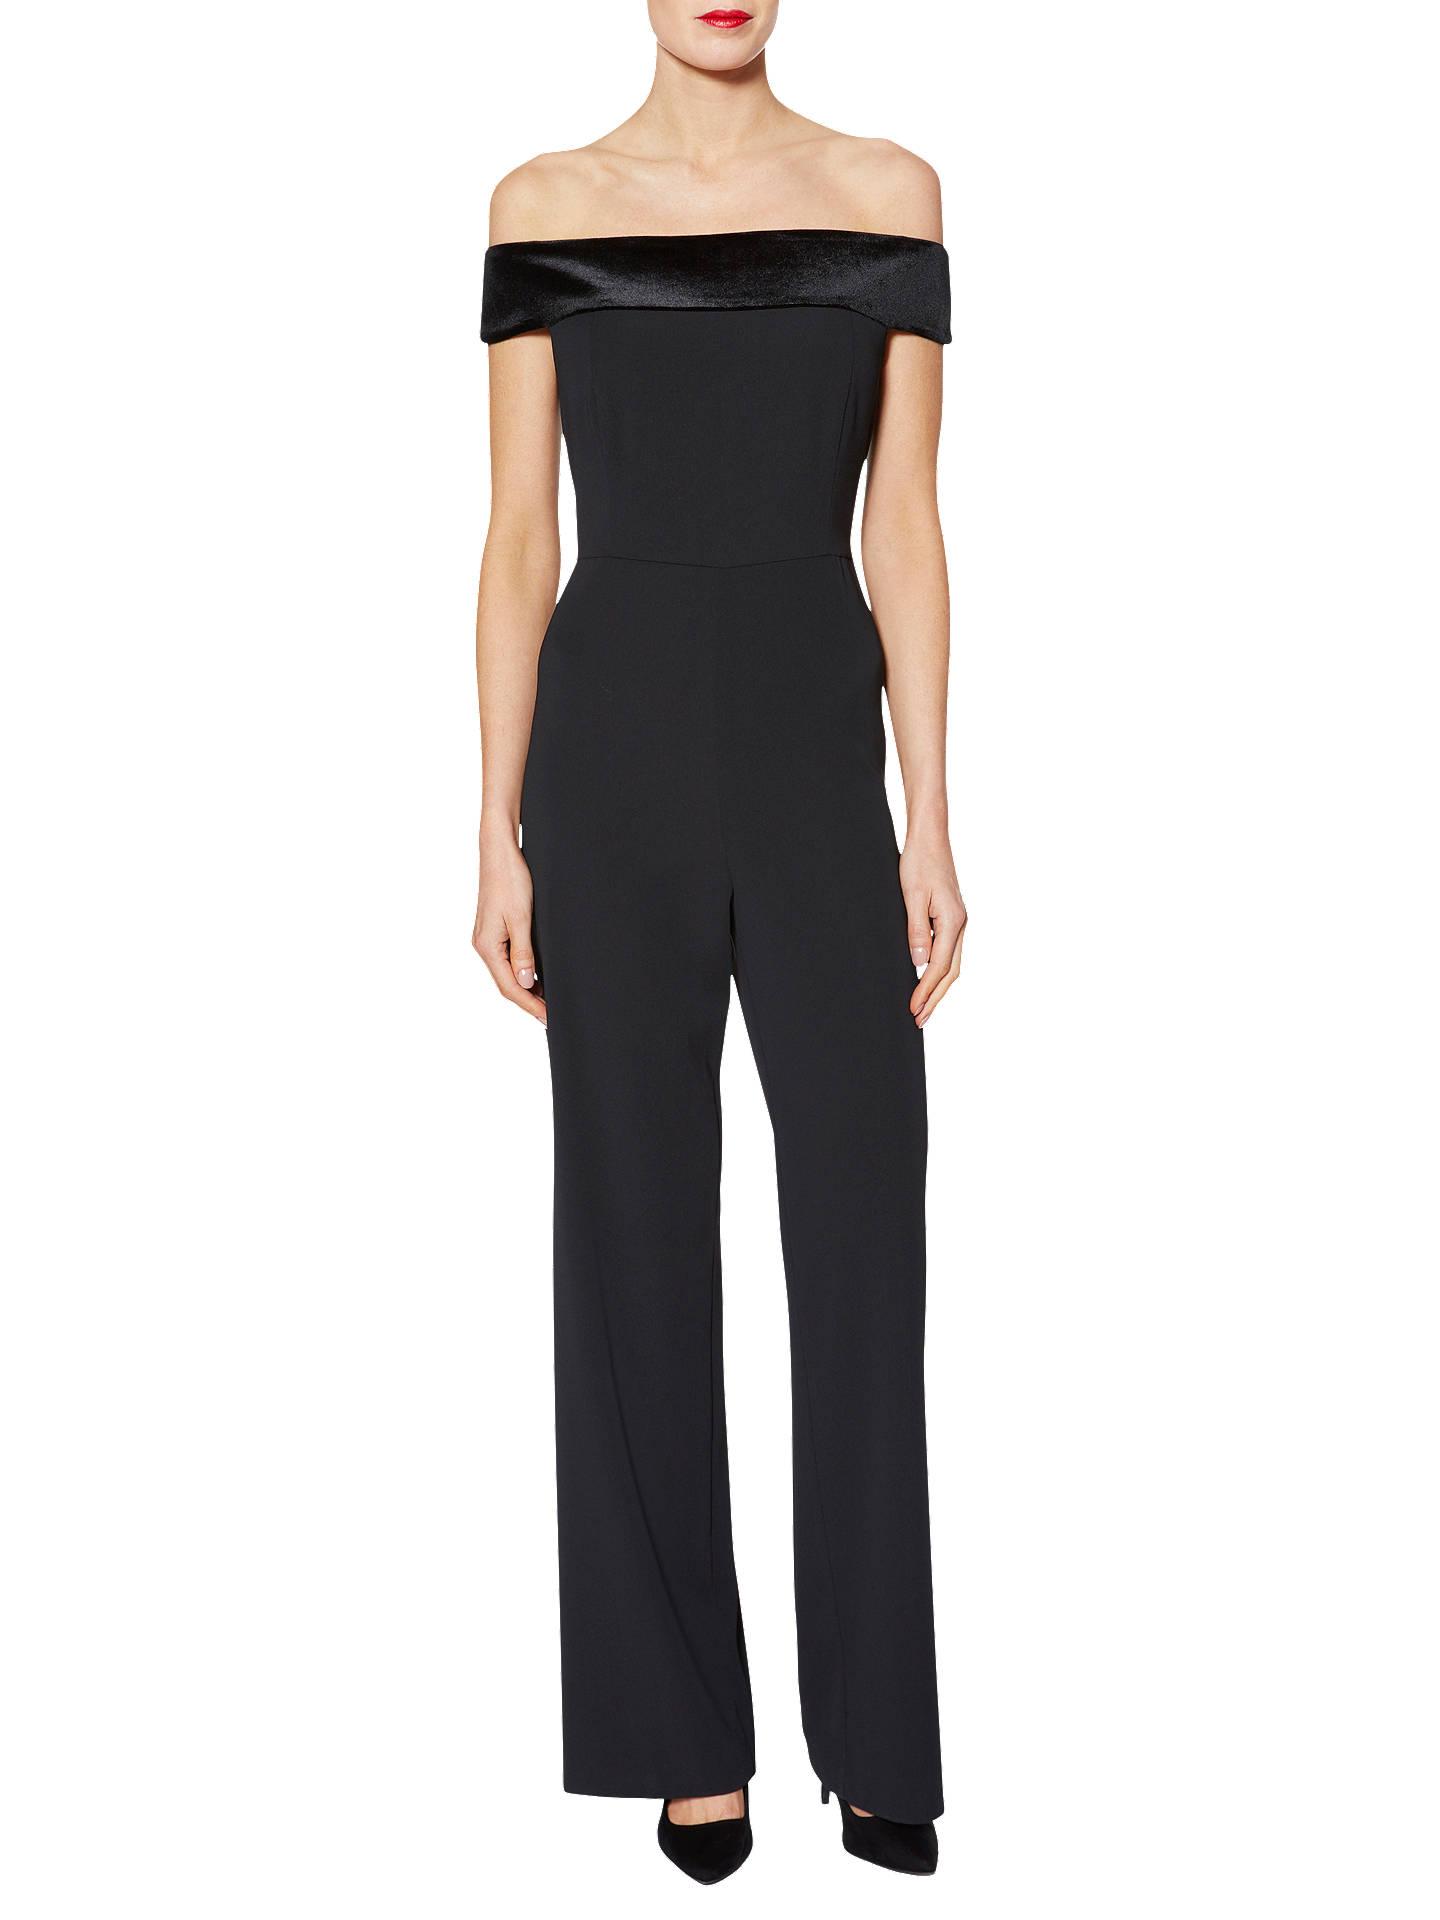 8fb05a2e50 Buy Gina Bacconi Hayley Bardot Jumpsuit